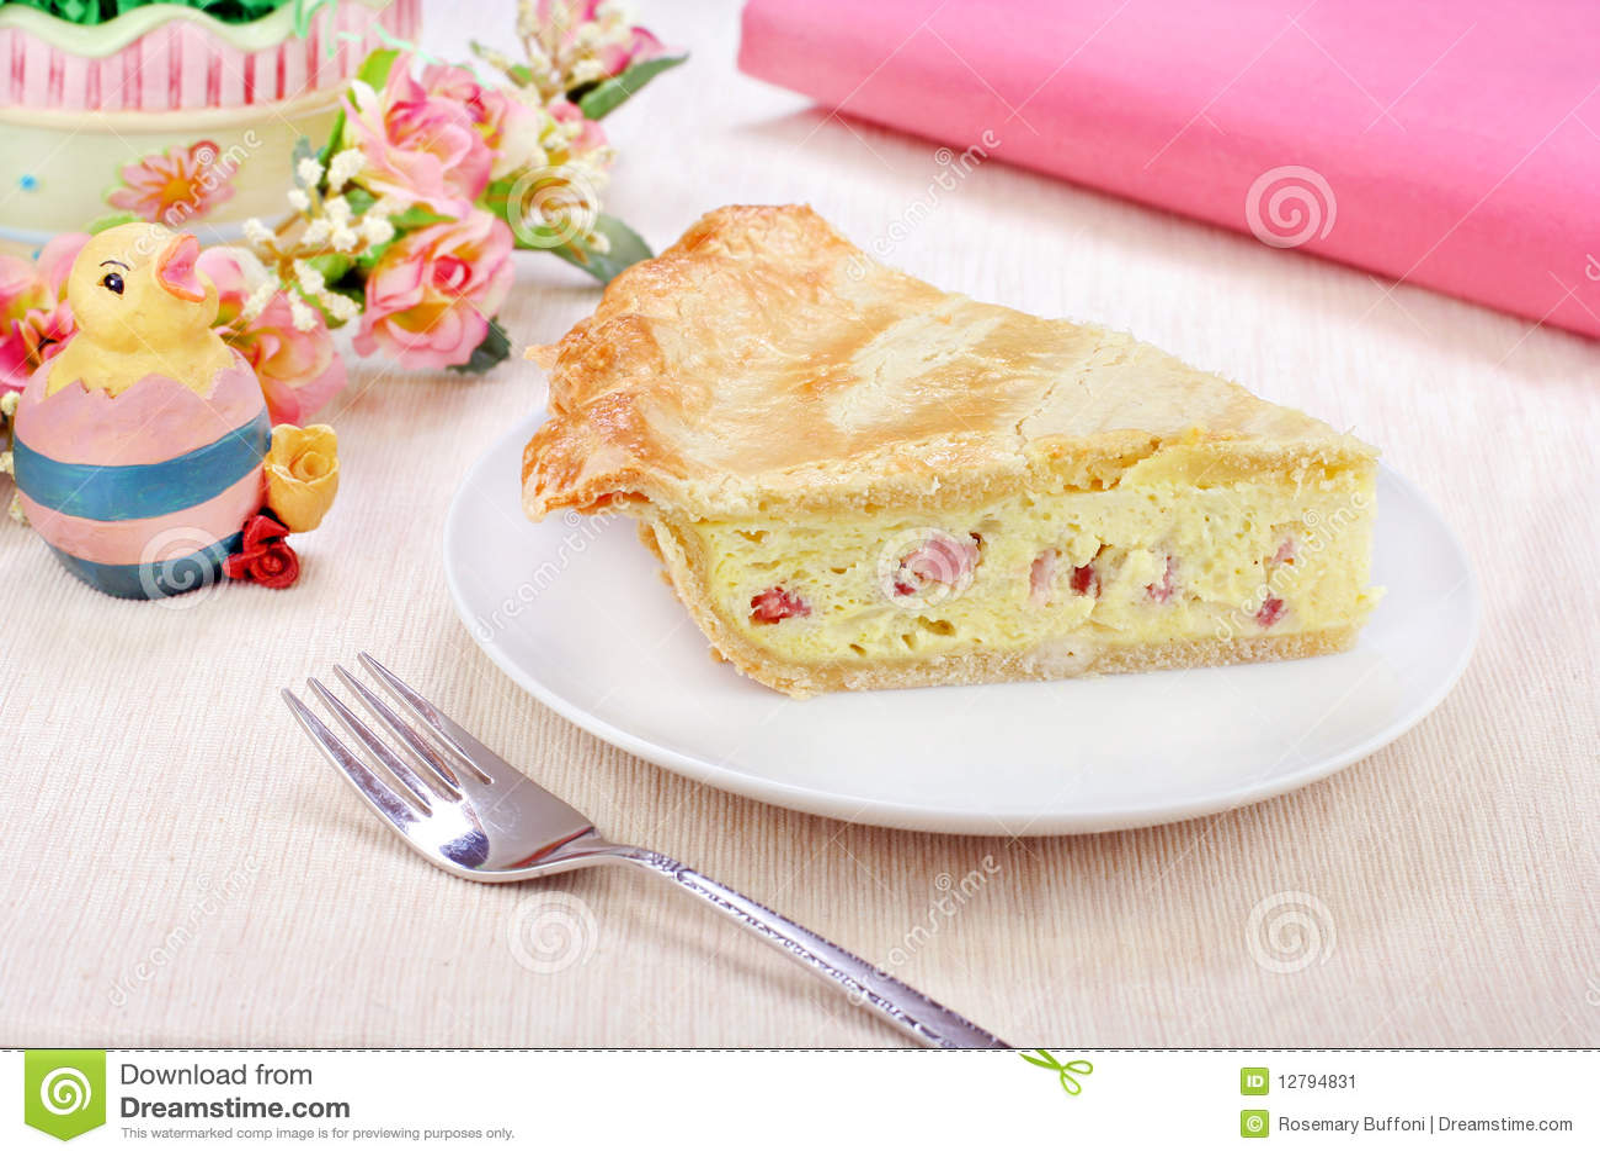 Italian Easter Pie Stock Image - Image: 12794831